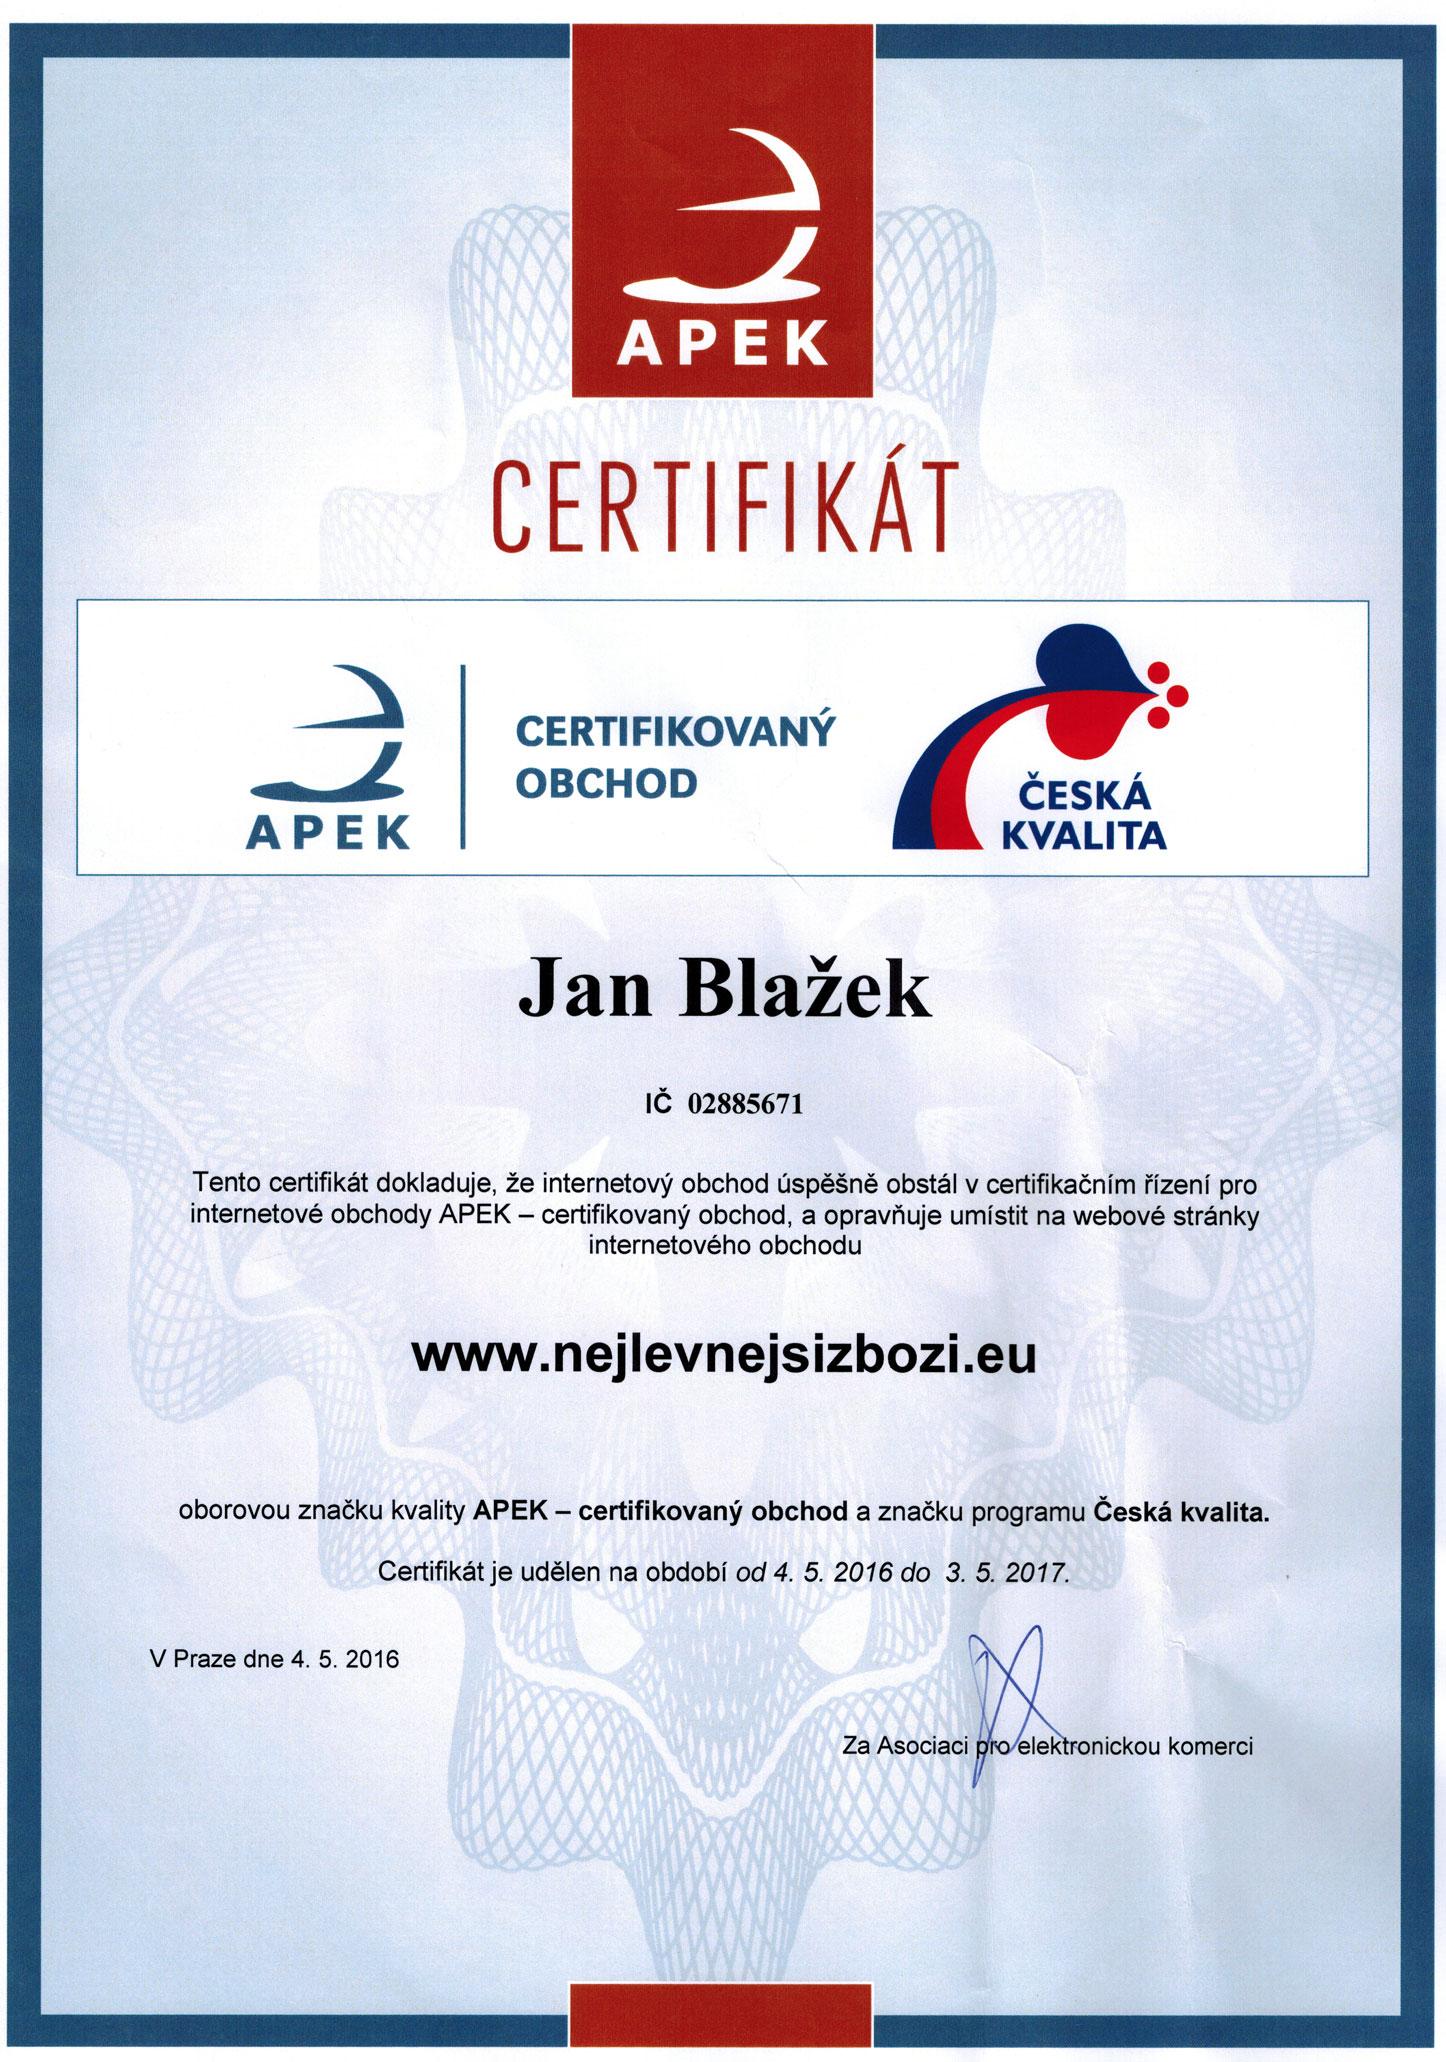 uprava_APEK---ČESKÁ-KVALITA